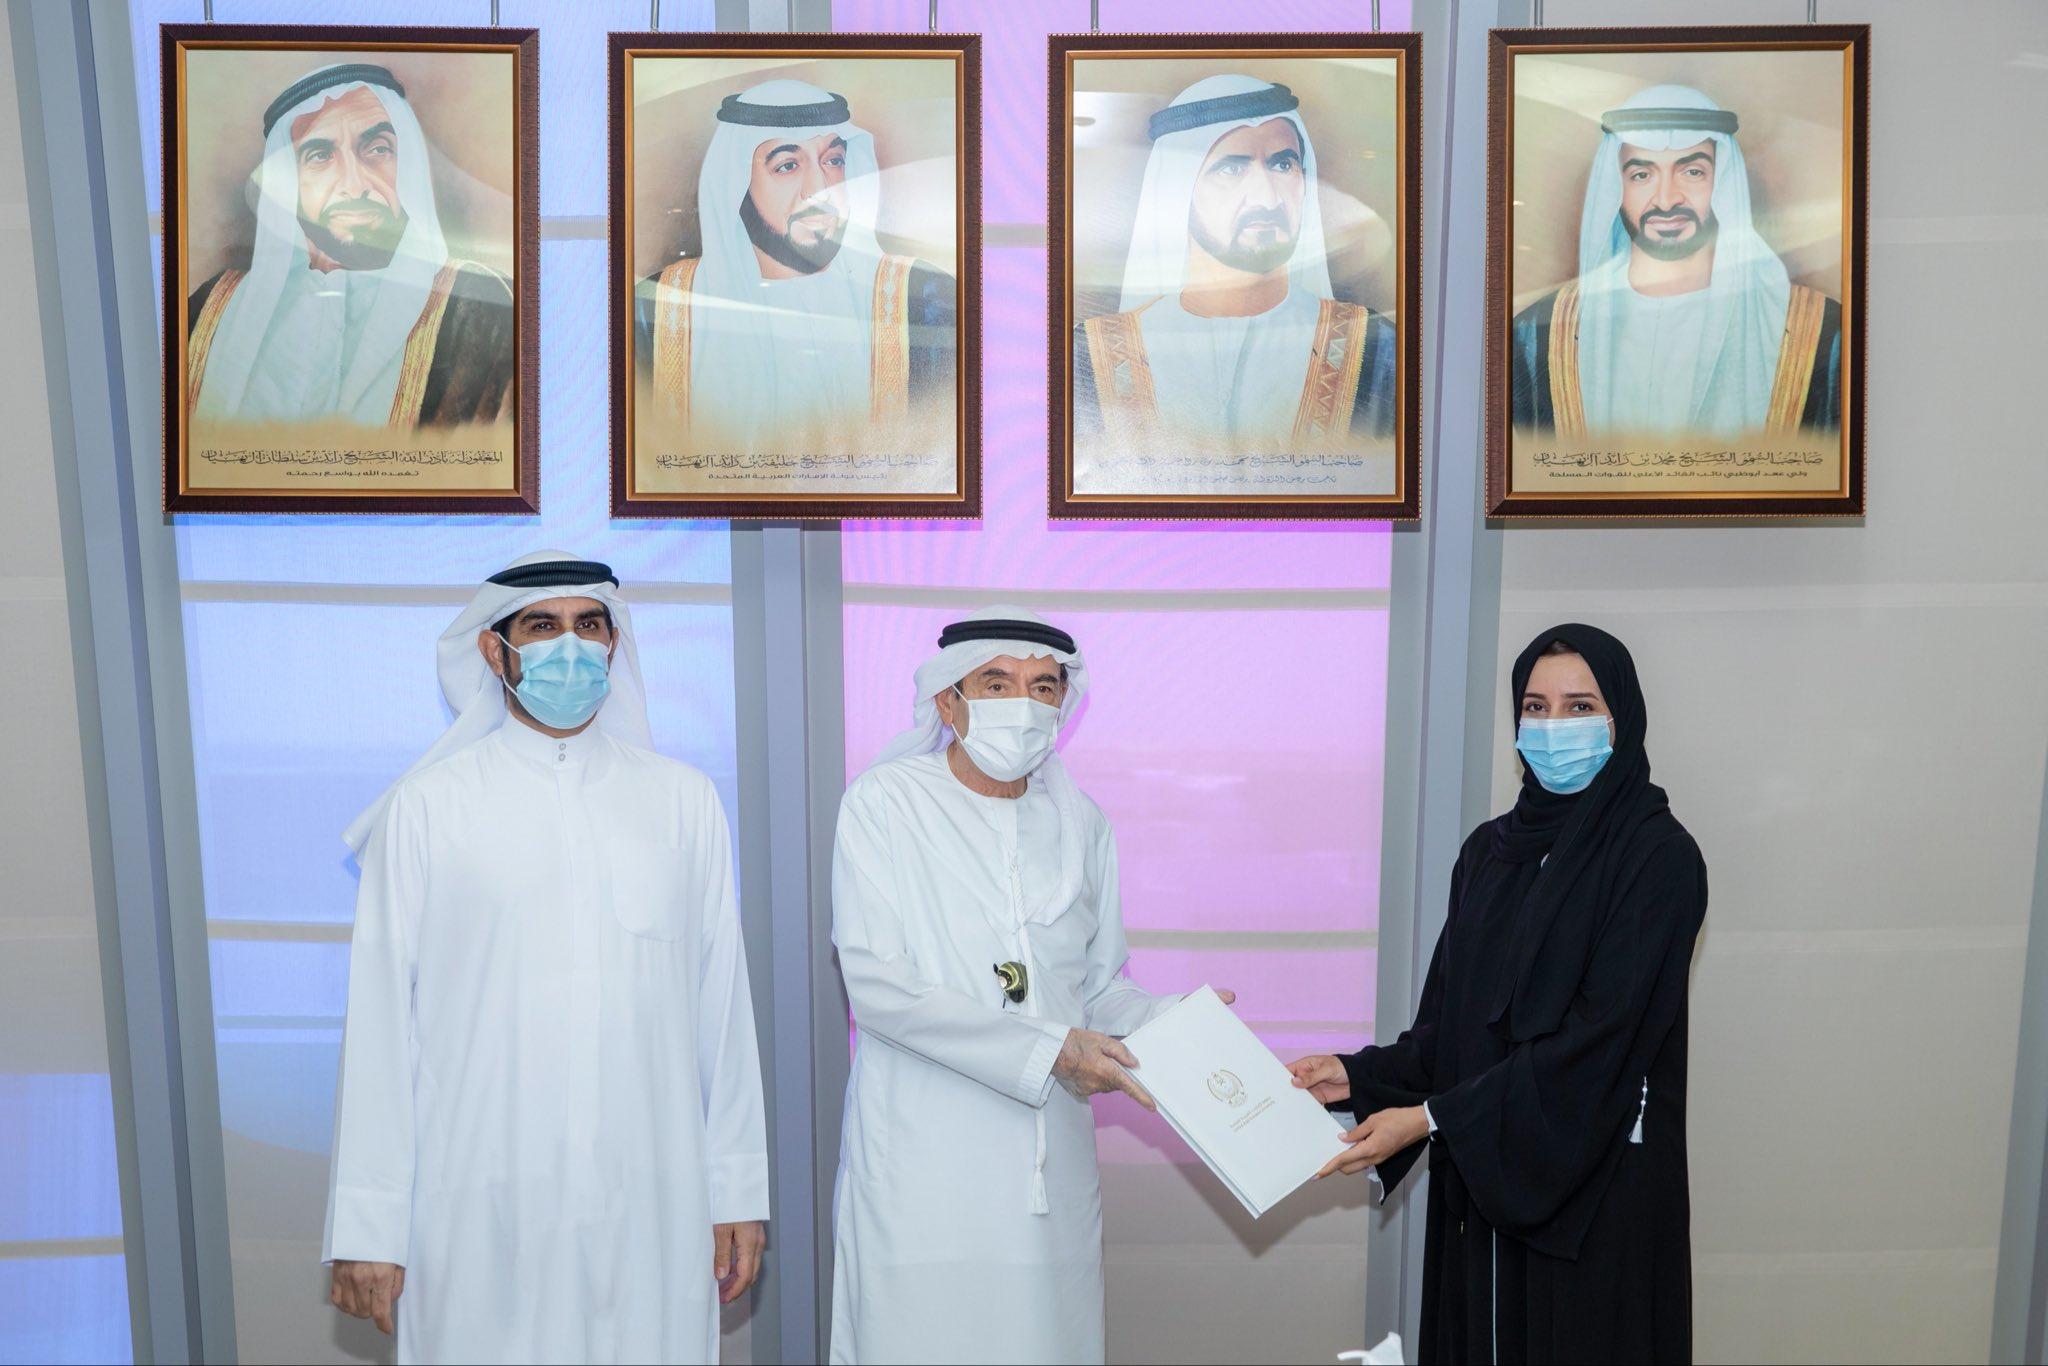 UAEU Chancellor meets one of newest Fellows of 'International Positive Psychology Association'